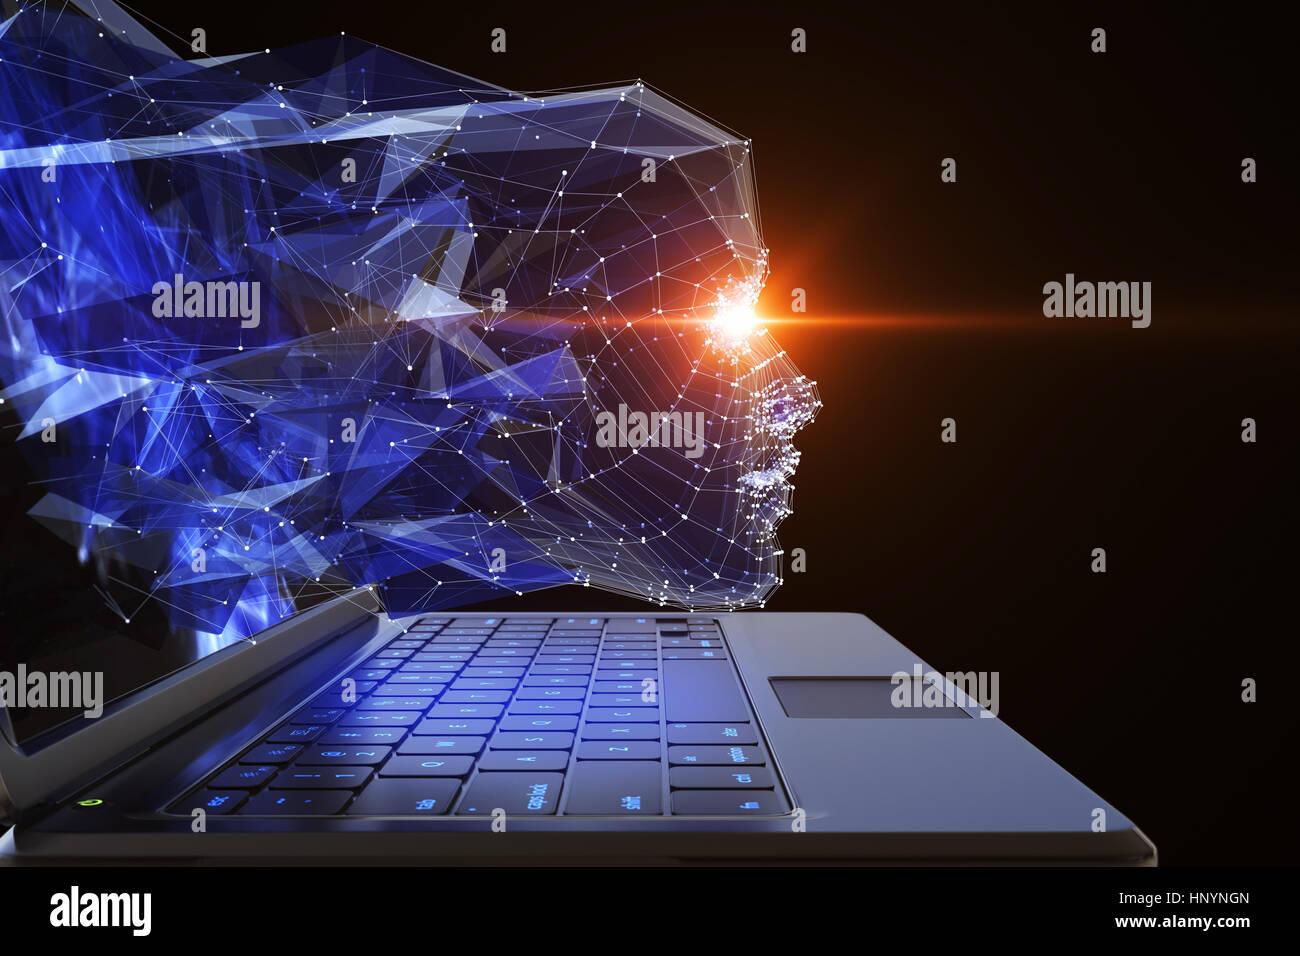 Neuron network concept. 3D illustration - Stock Image